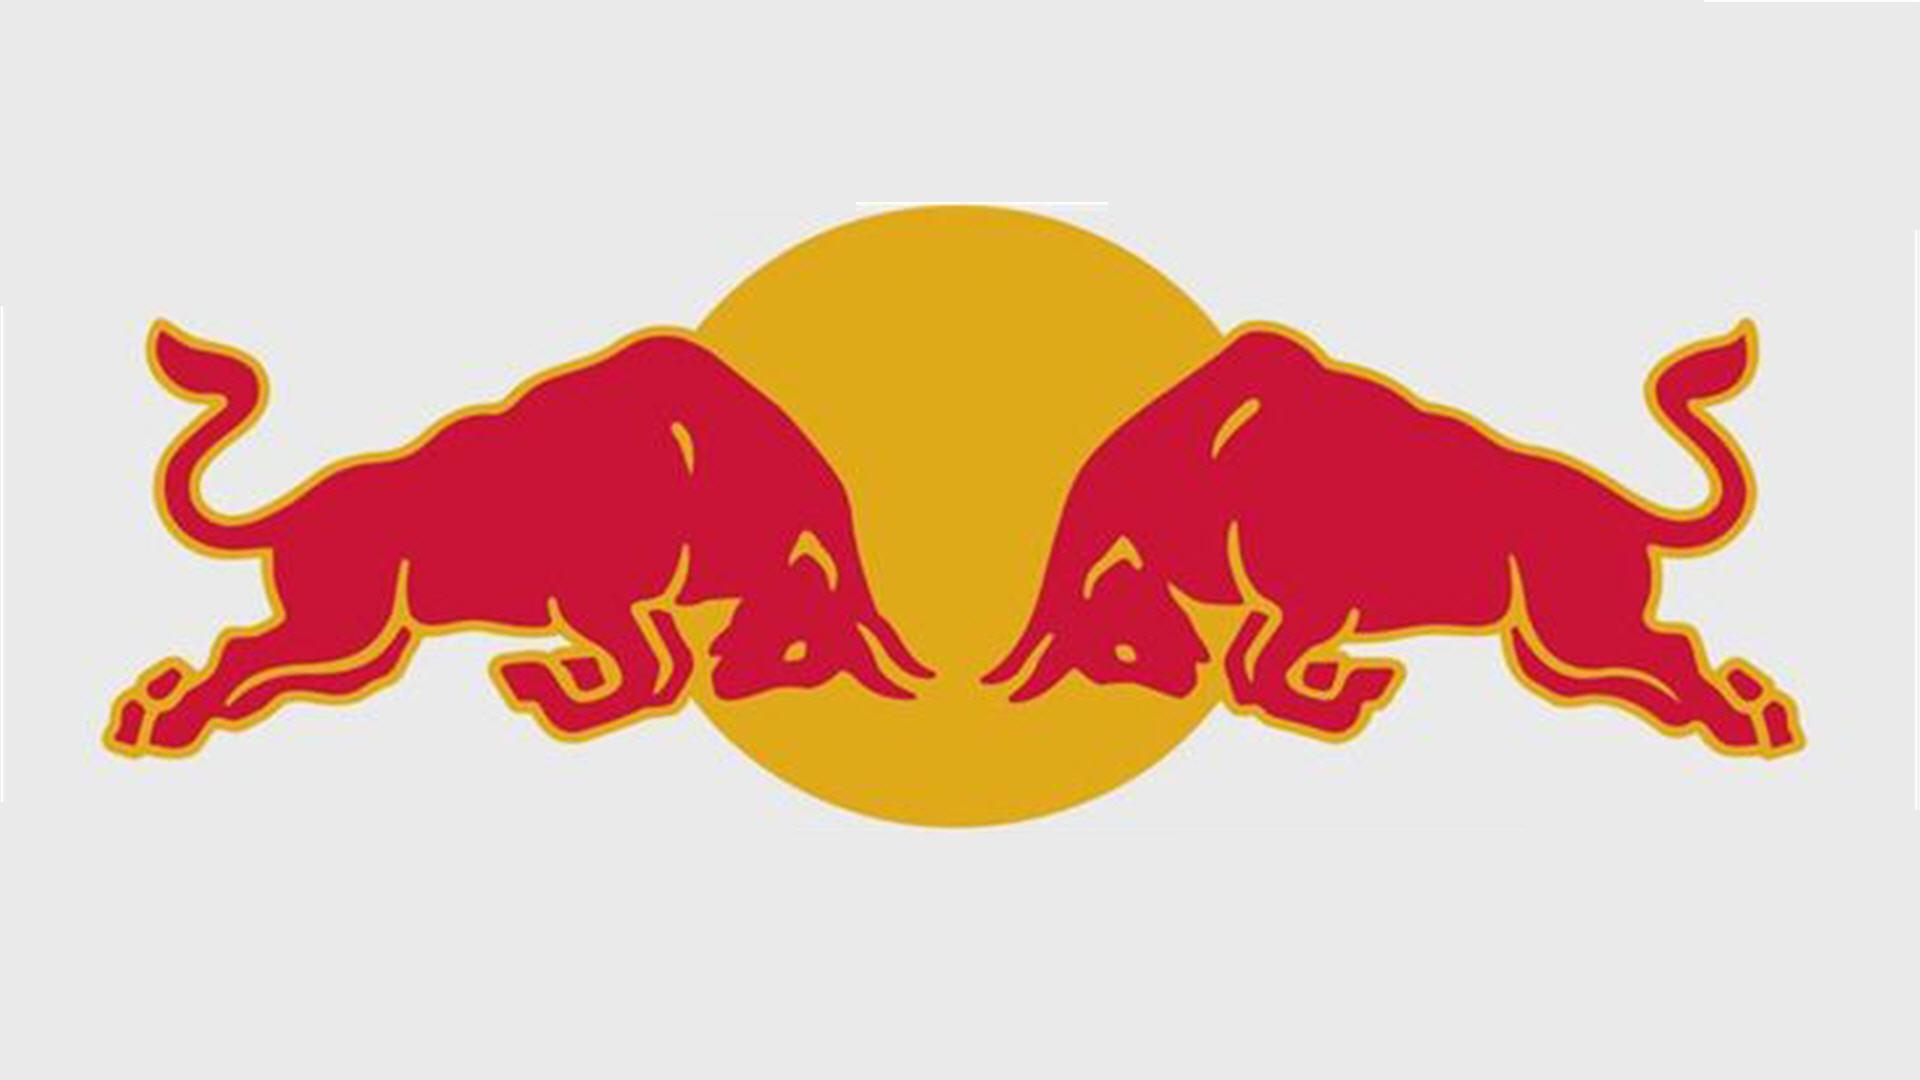 Red Bull Logo PNG - 32240